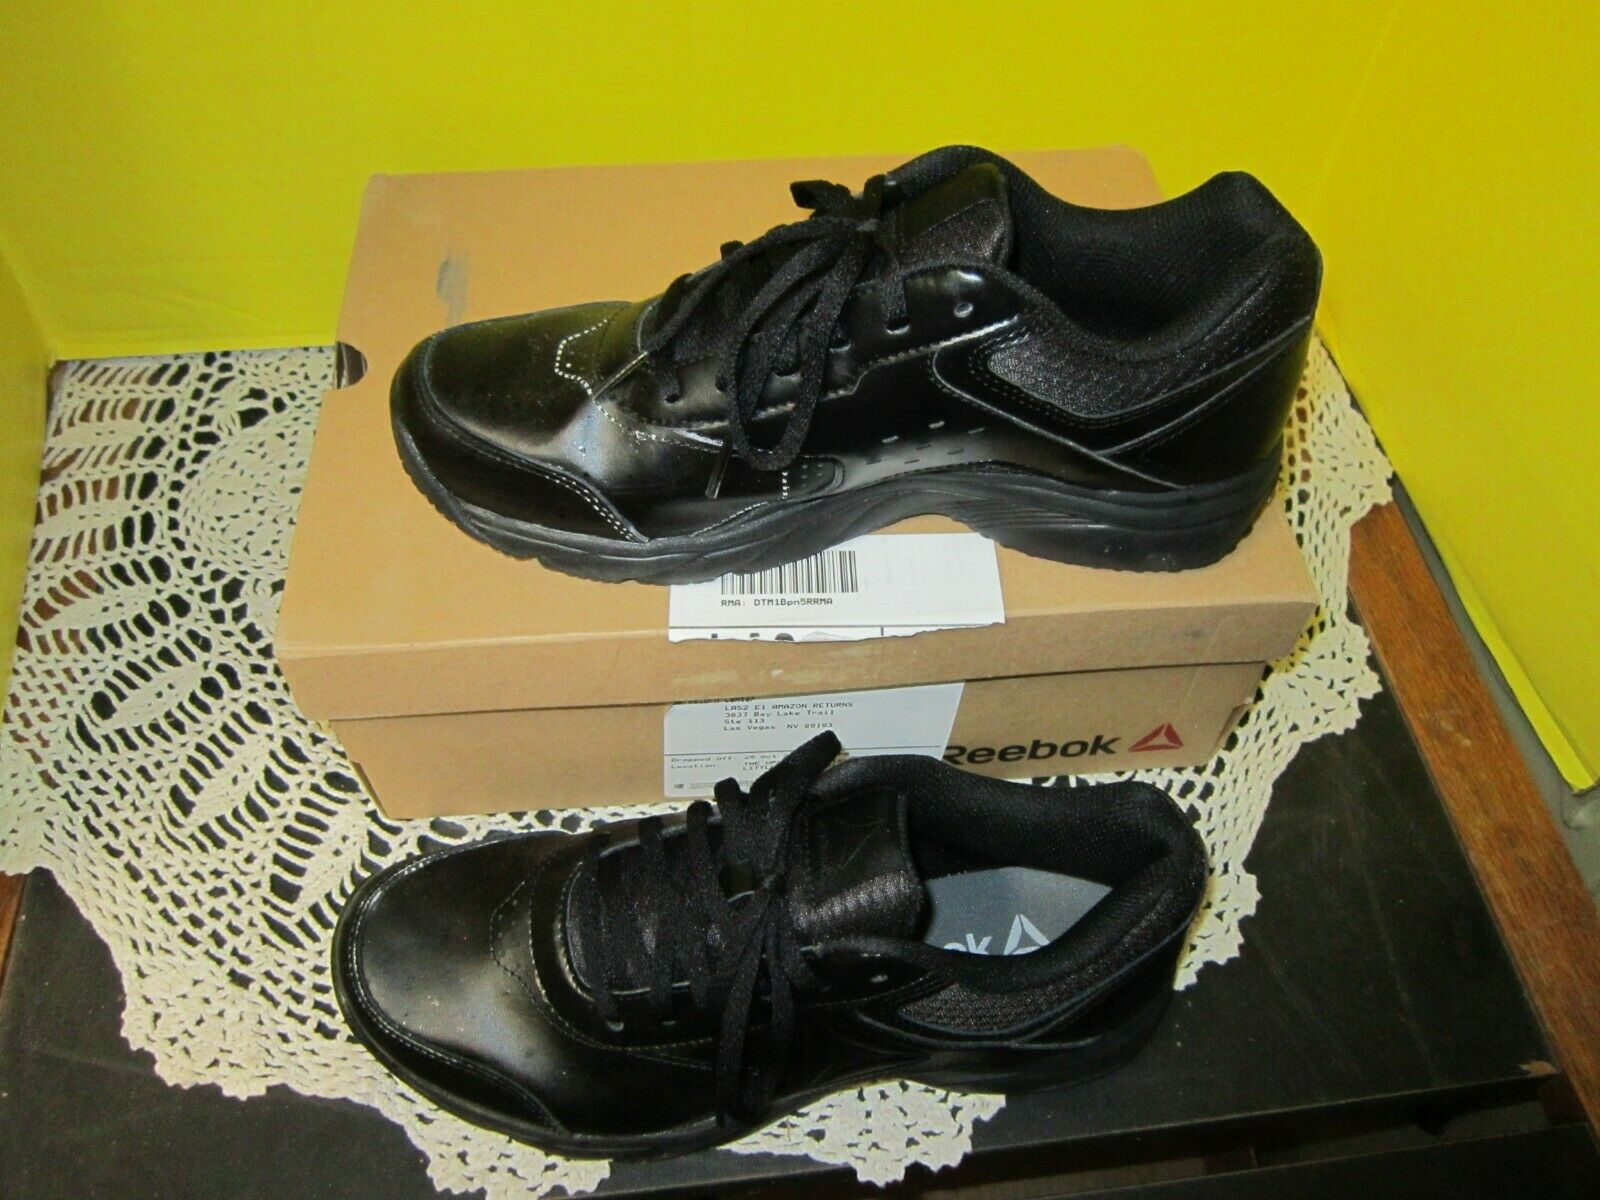 lote preocupación consenso  Reebok Work N Cushion 3.0 Womens Walking Shoes BS9527 Black Faux Leather  8.5 M 191036636414 | eBay